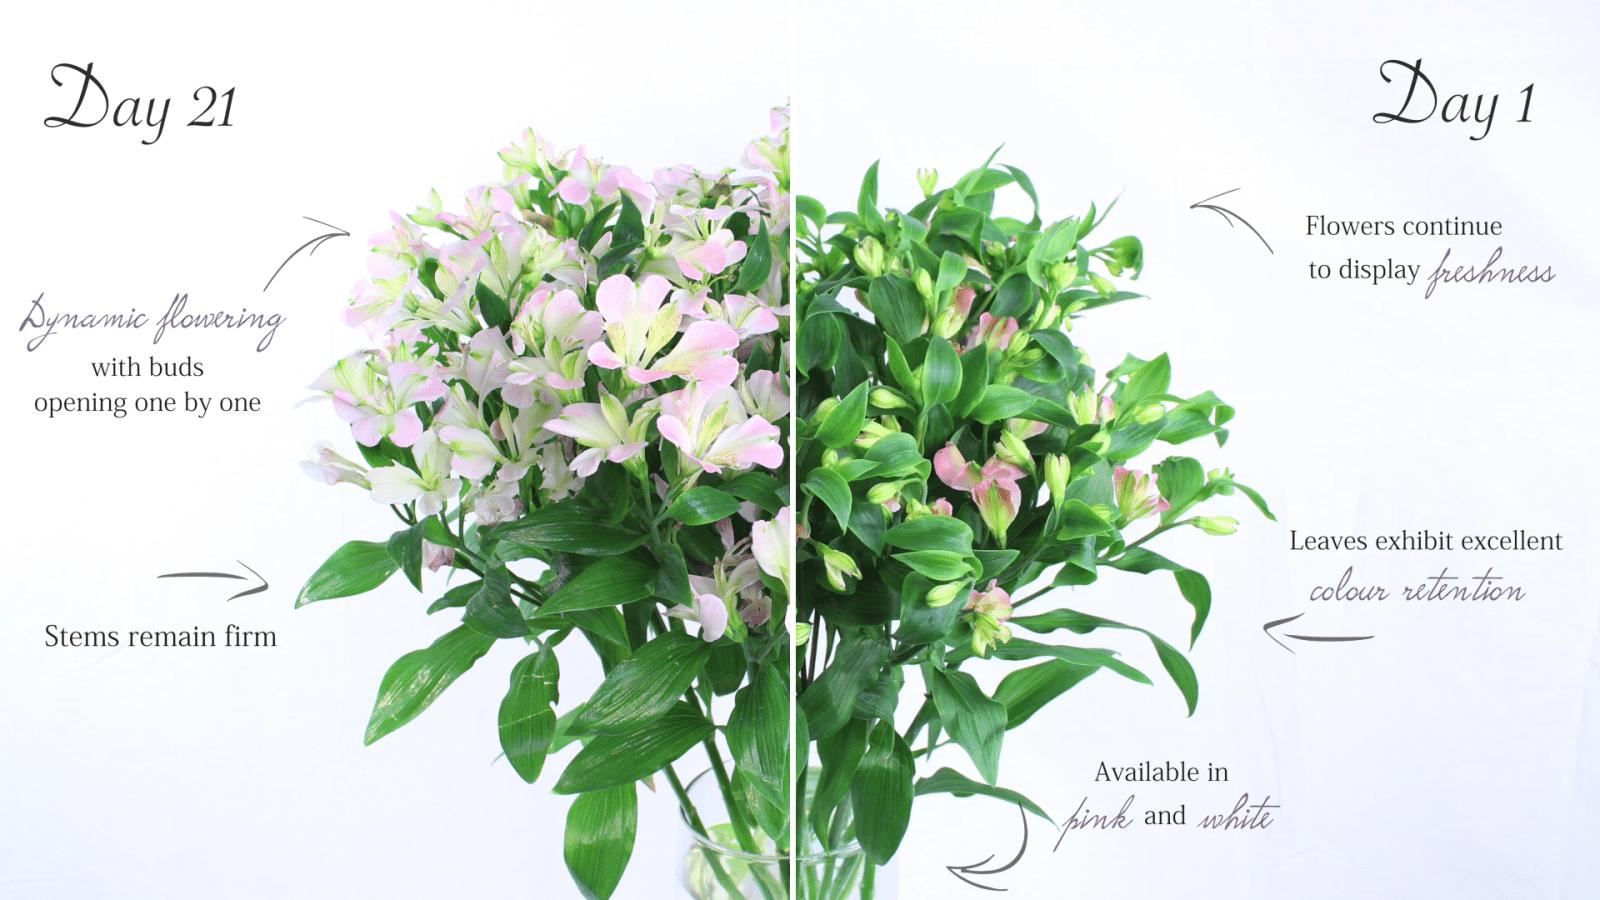 Charmelia Flower wholesaler